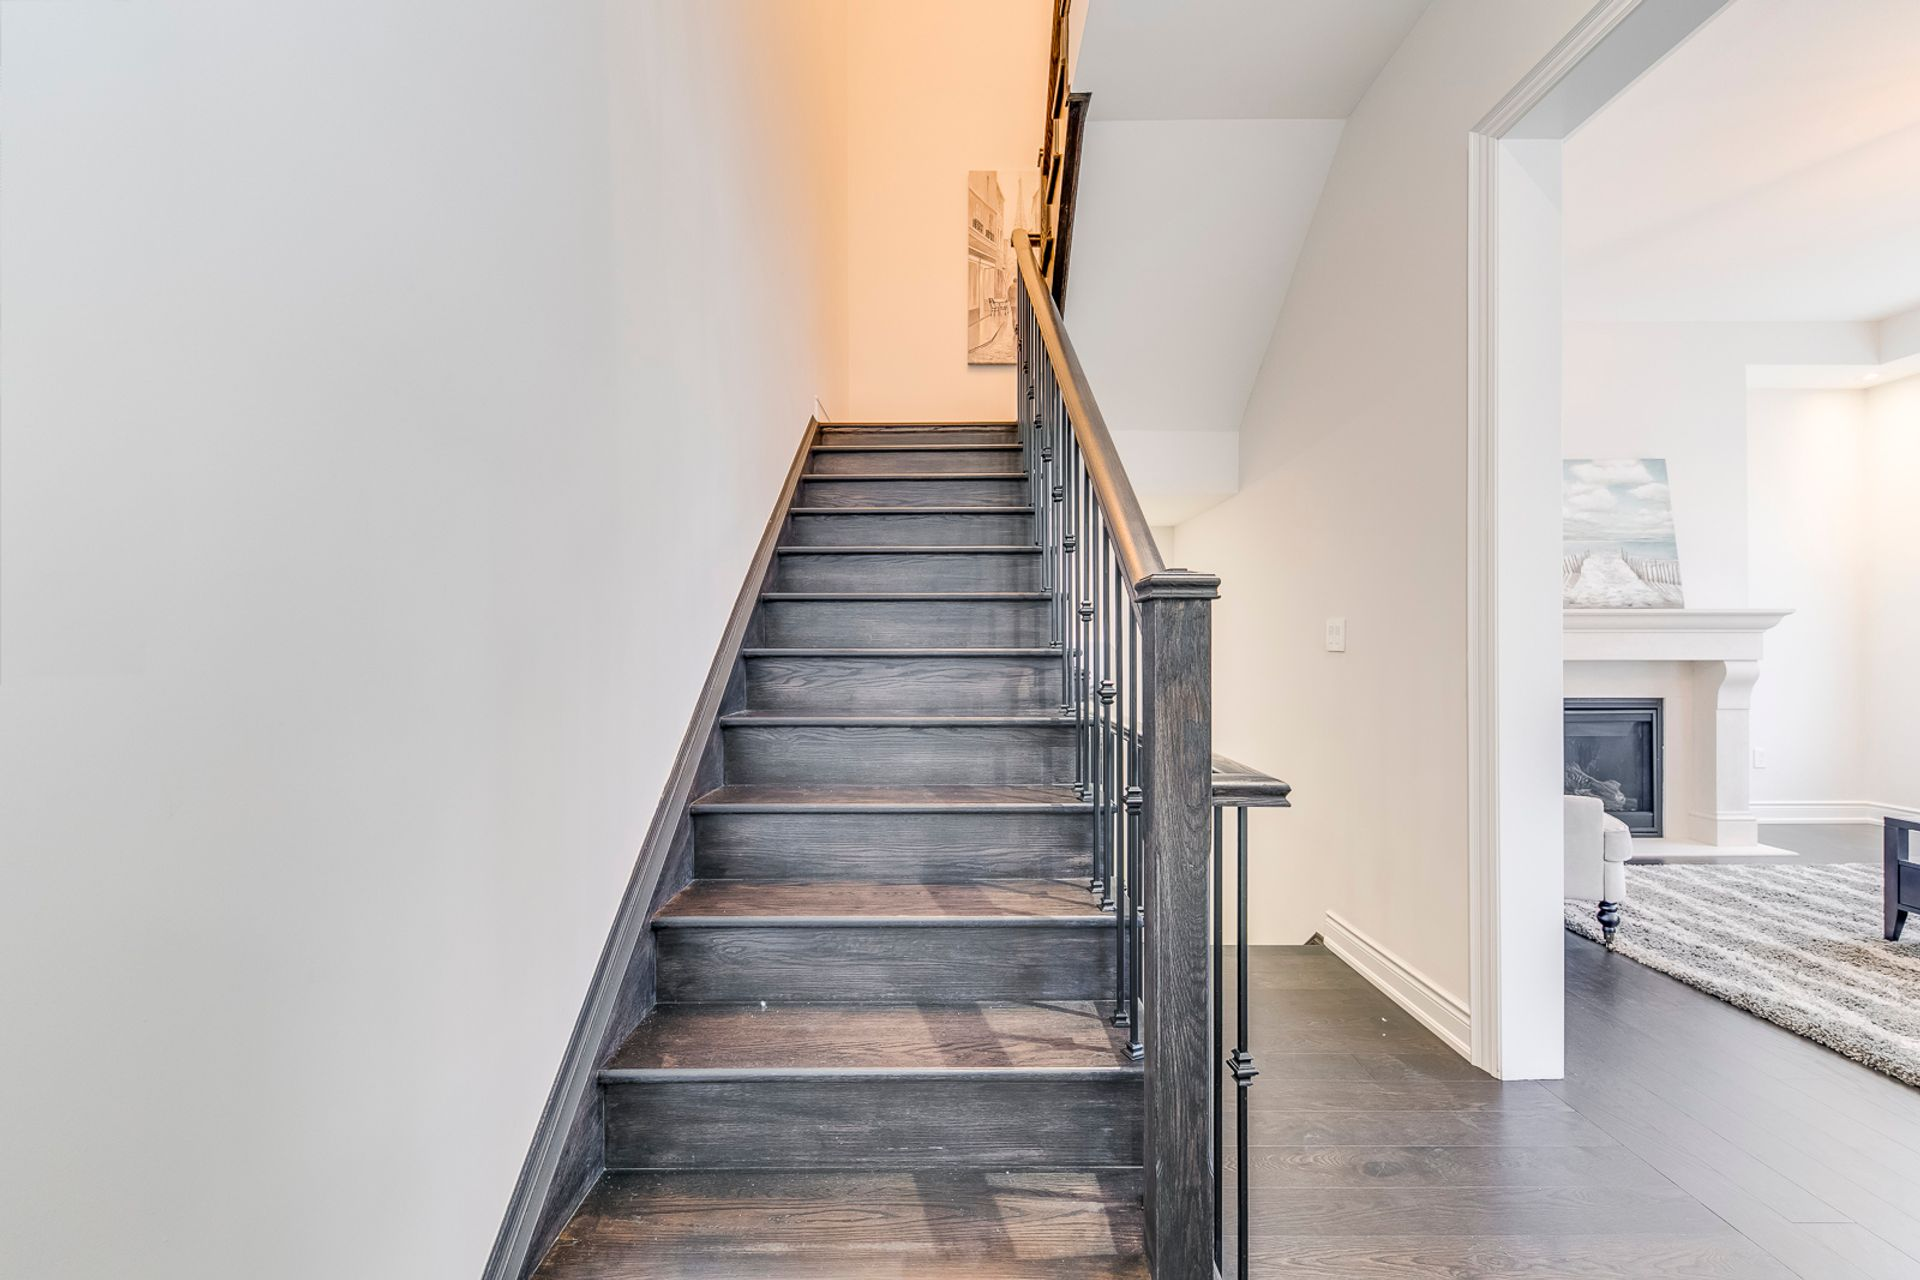 Stairs - 3048 Parsonage Cres, Oakville - Elite3 & Team at 3048 Parsonage Crescent, Rural Oakville, Oakville